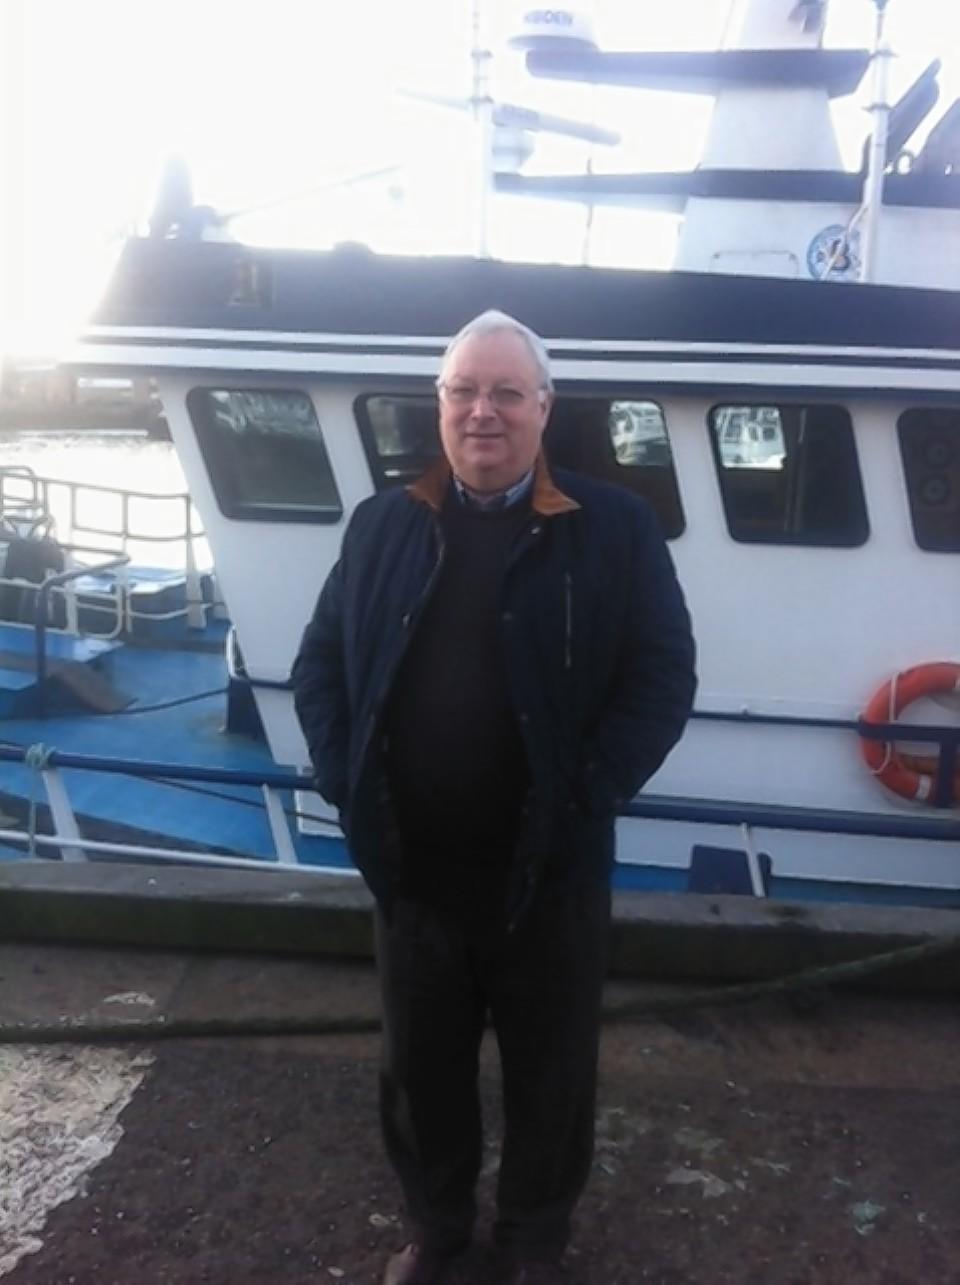 Scottish Fishermen's Organisation chief executive Iain MacSween